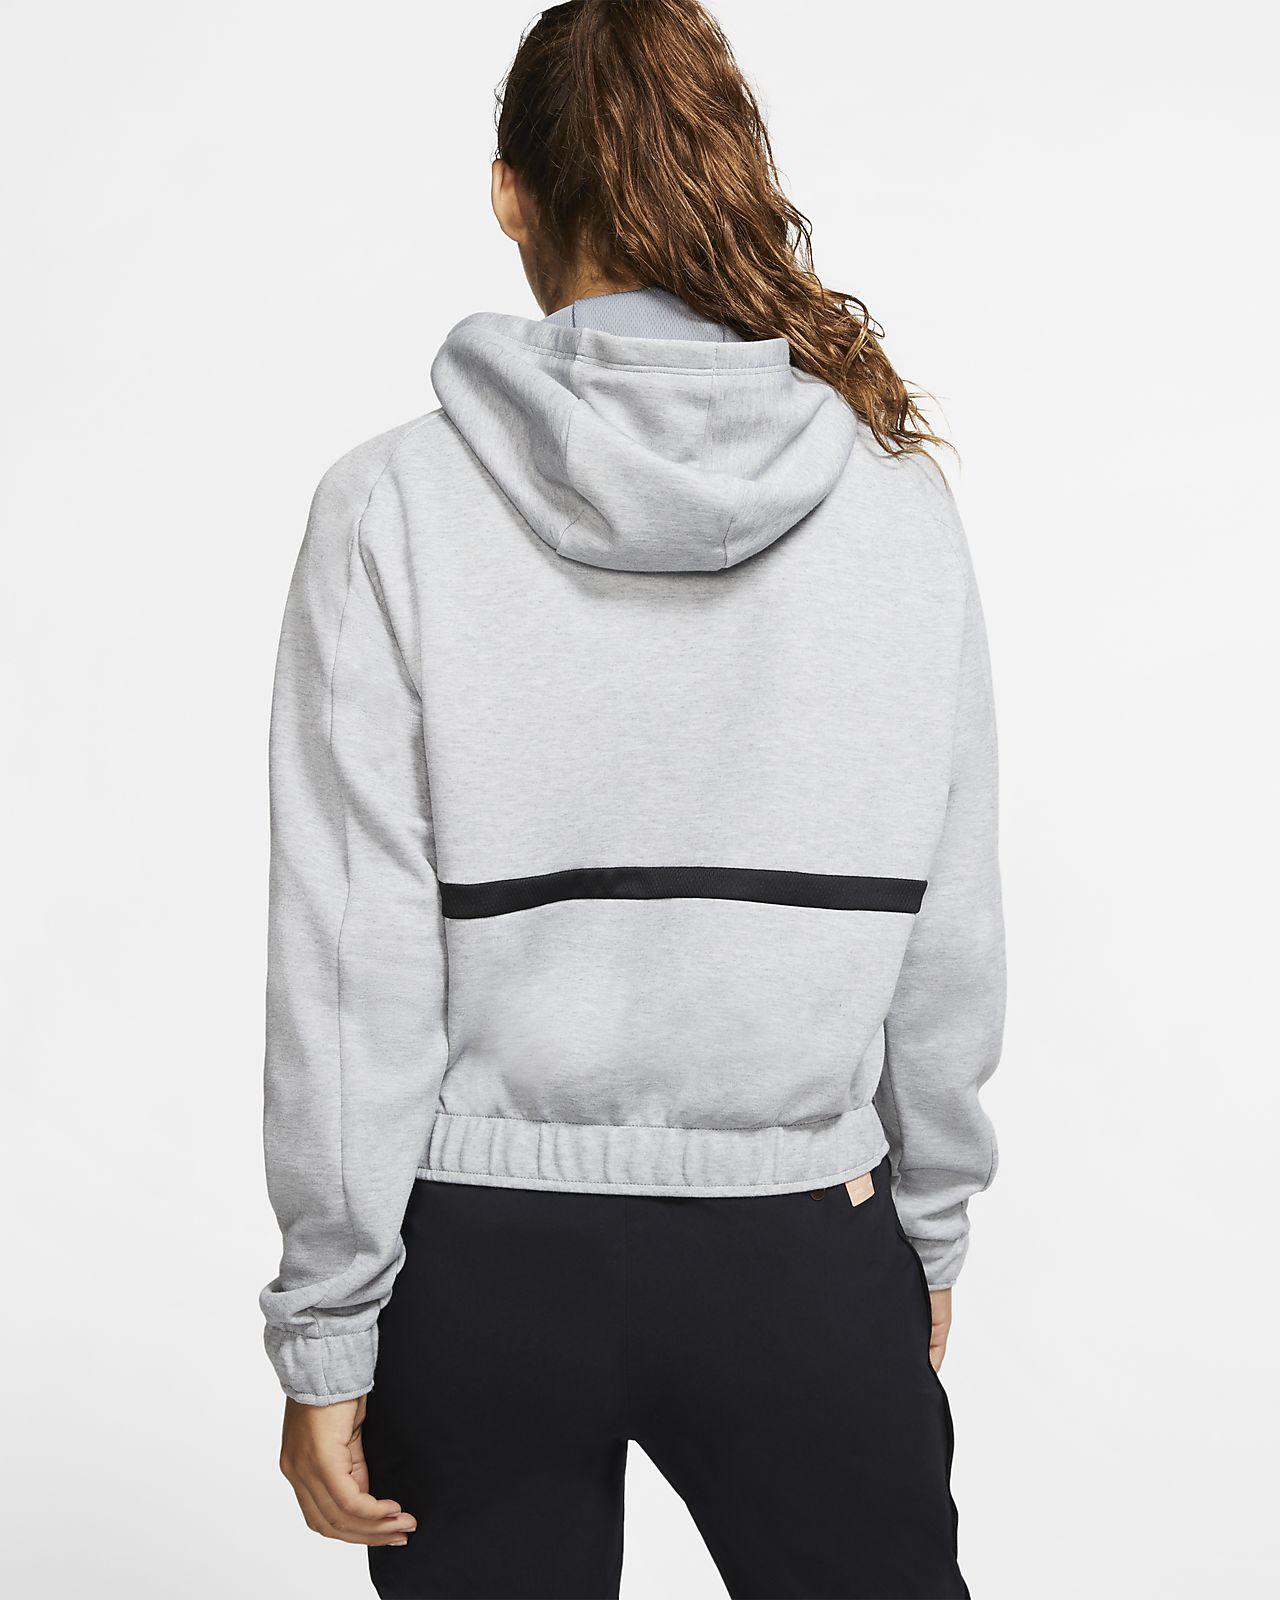 Nike Damen Hoodie Kapuzenpullover Gr.XL (DE 42) Therma Fit